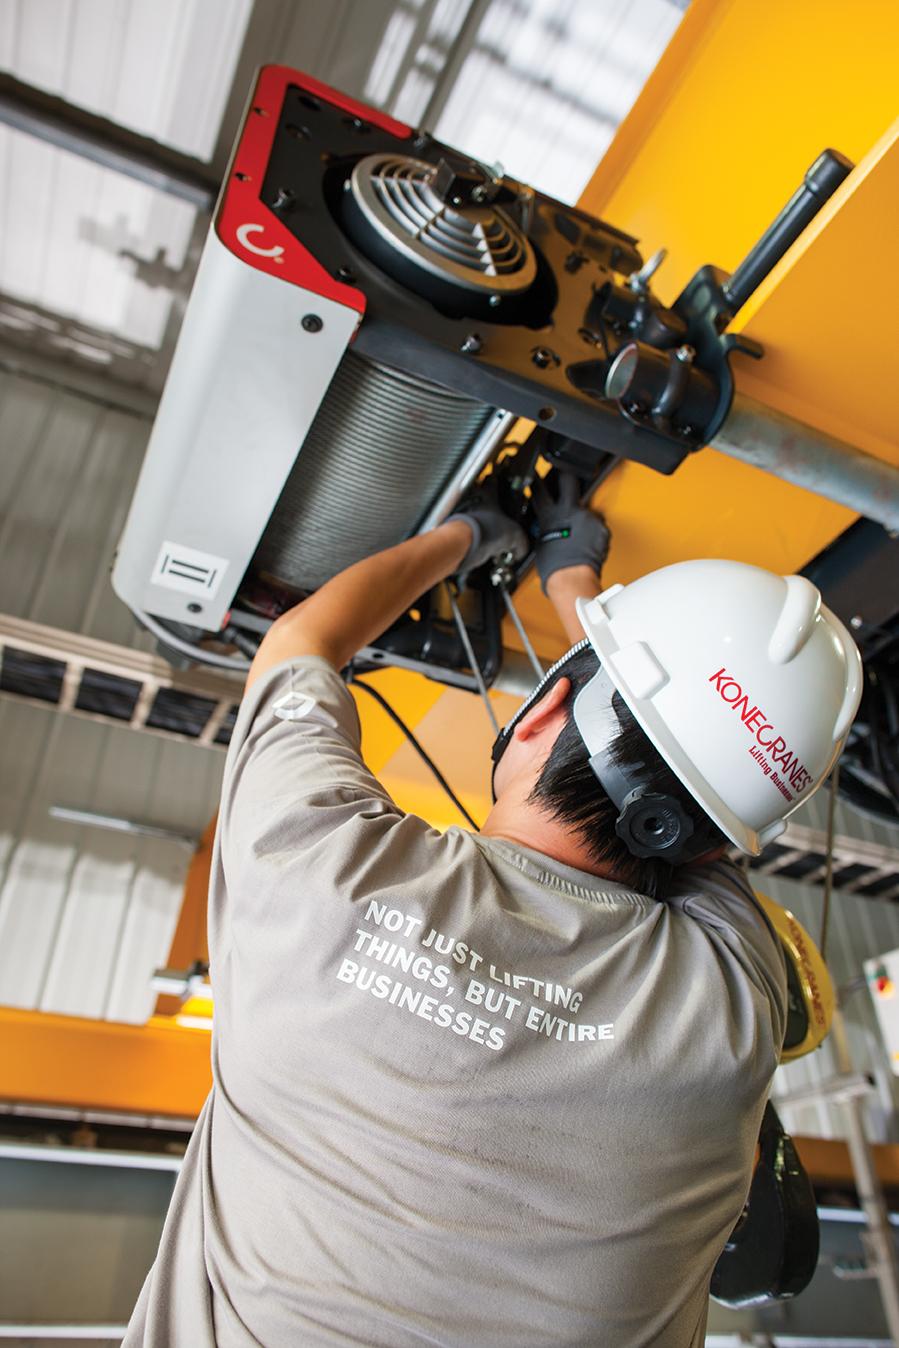 Overhead Crane Electrical Maintenance : Overhead crane repair konecranes